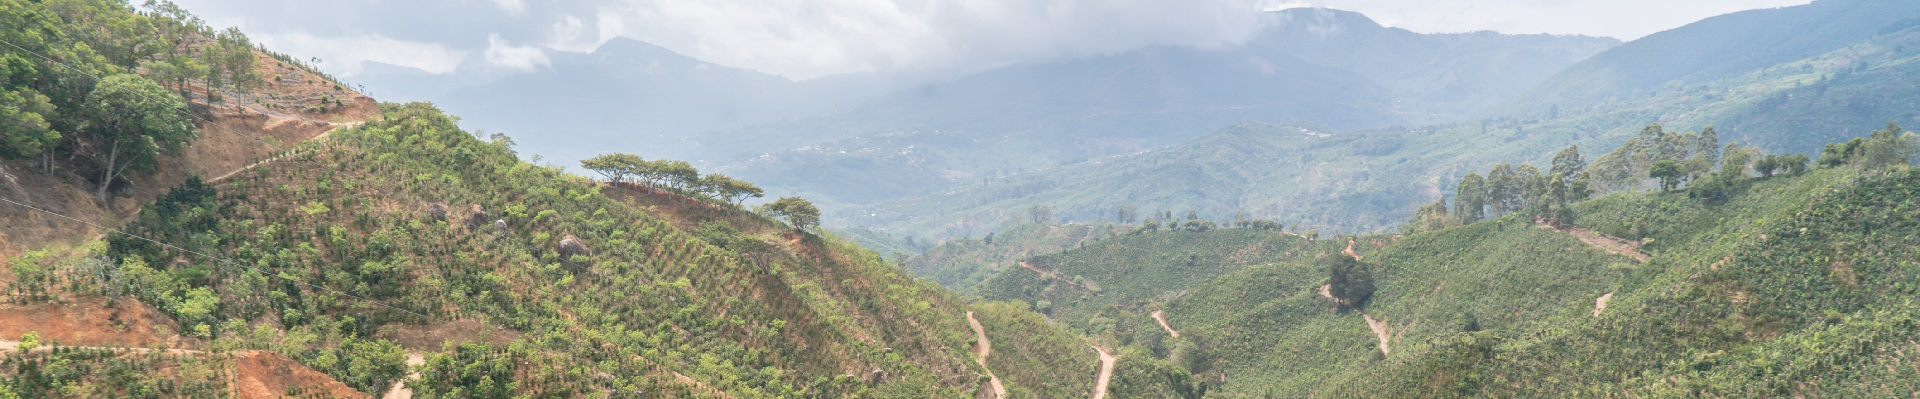 Costa Rica Kaffeeplantage